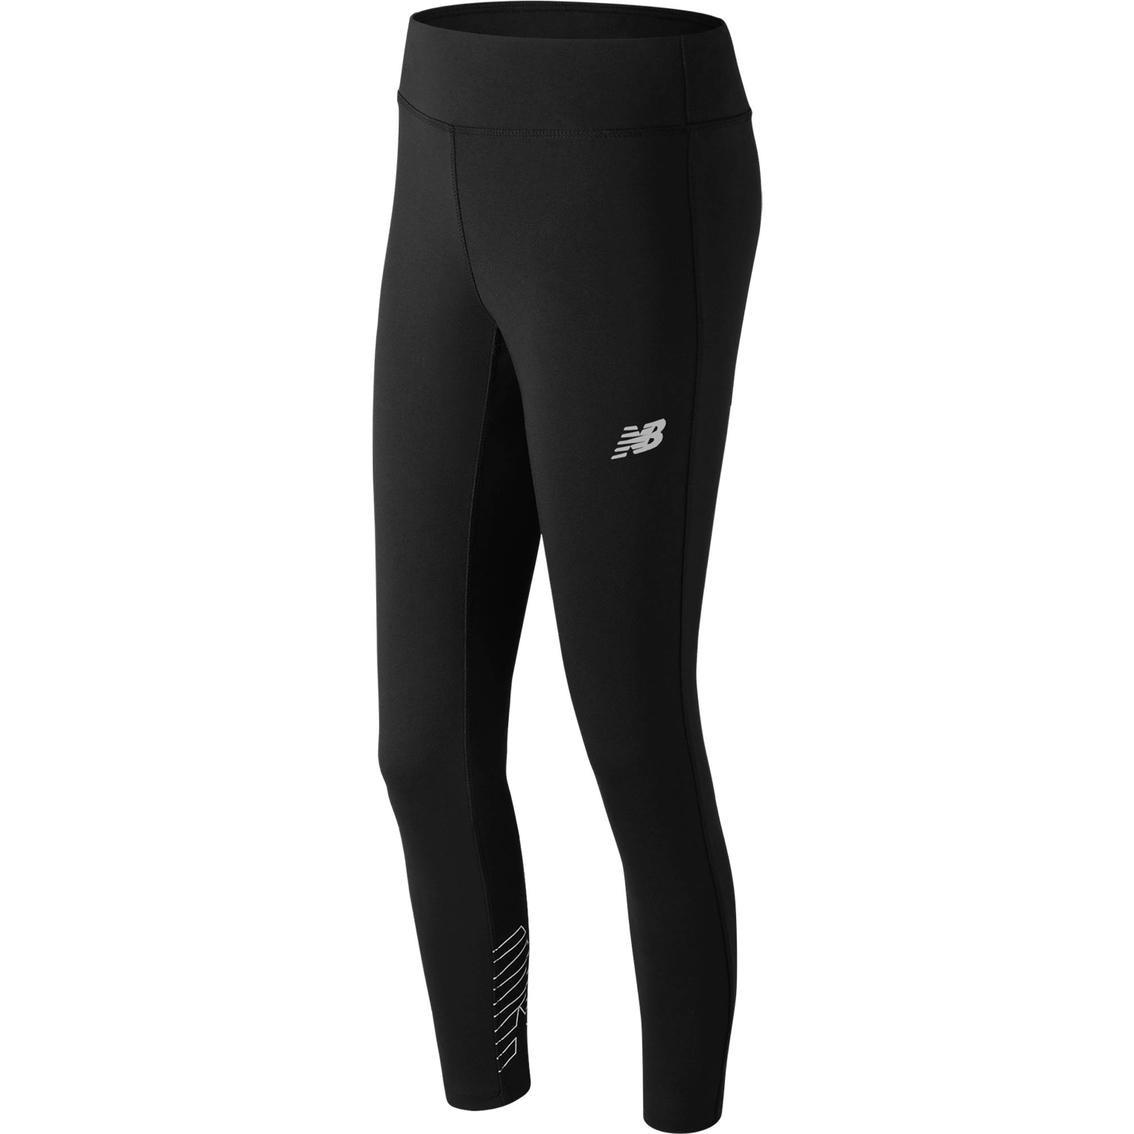 288d898759919 New Balance Athletic Leggings | Leggings | Apparel | Shop The Exchange